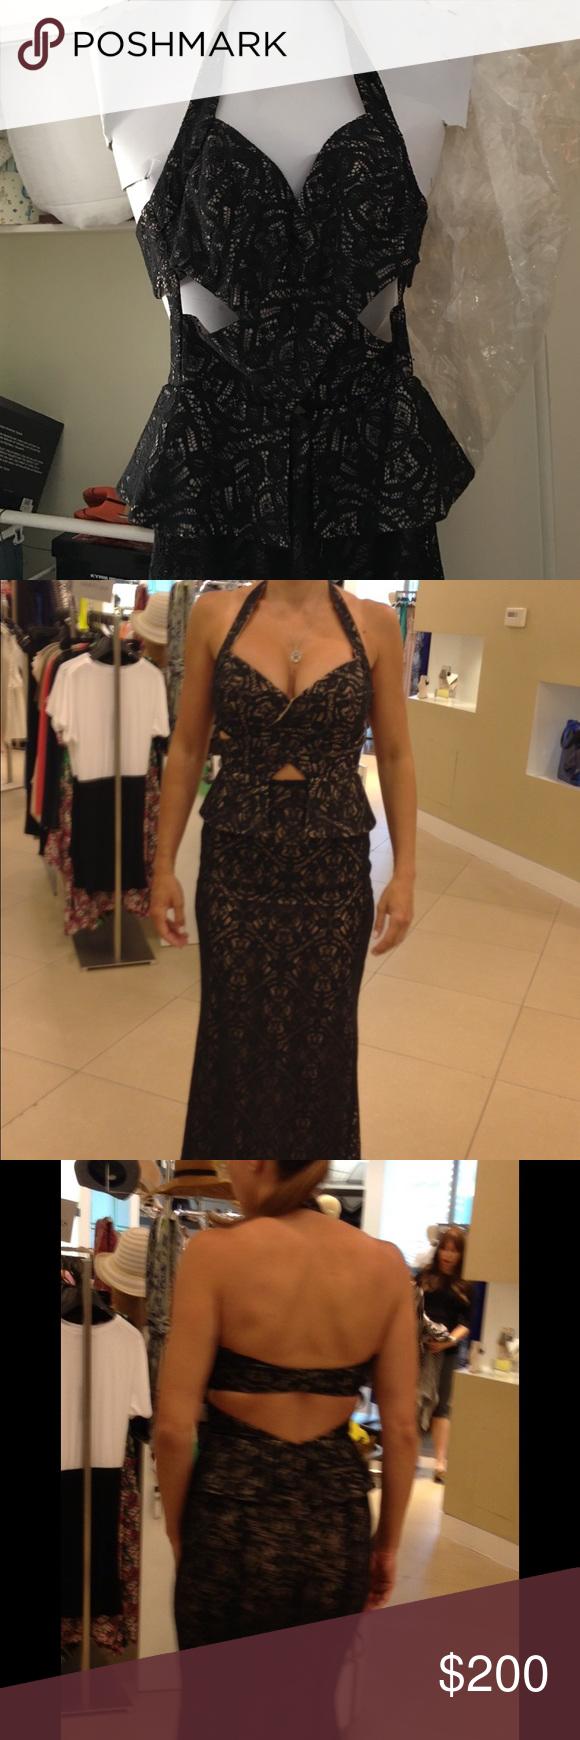 Bcbg black long dress long black lace dress halter neck and cut